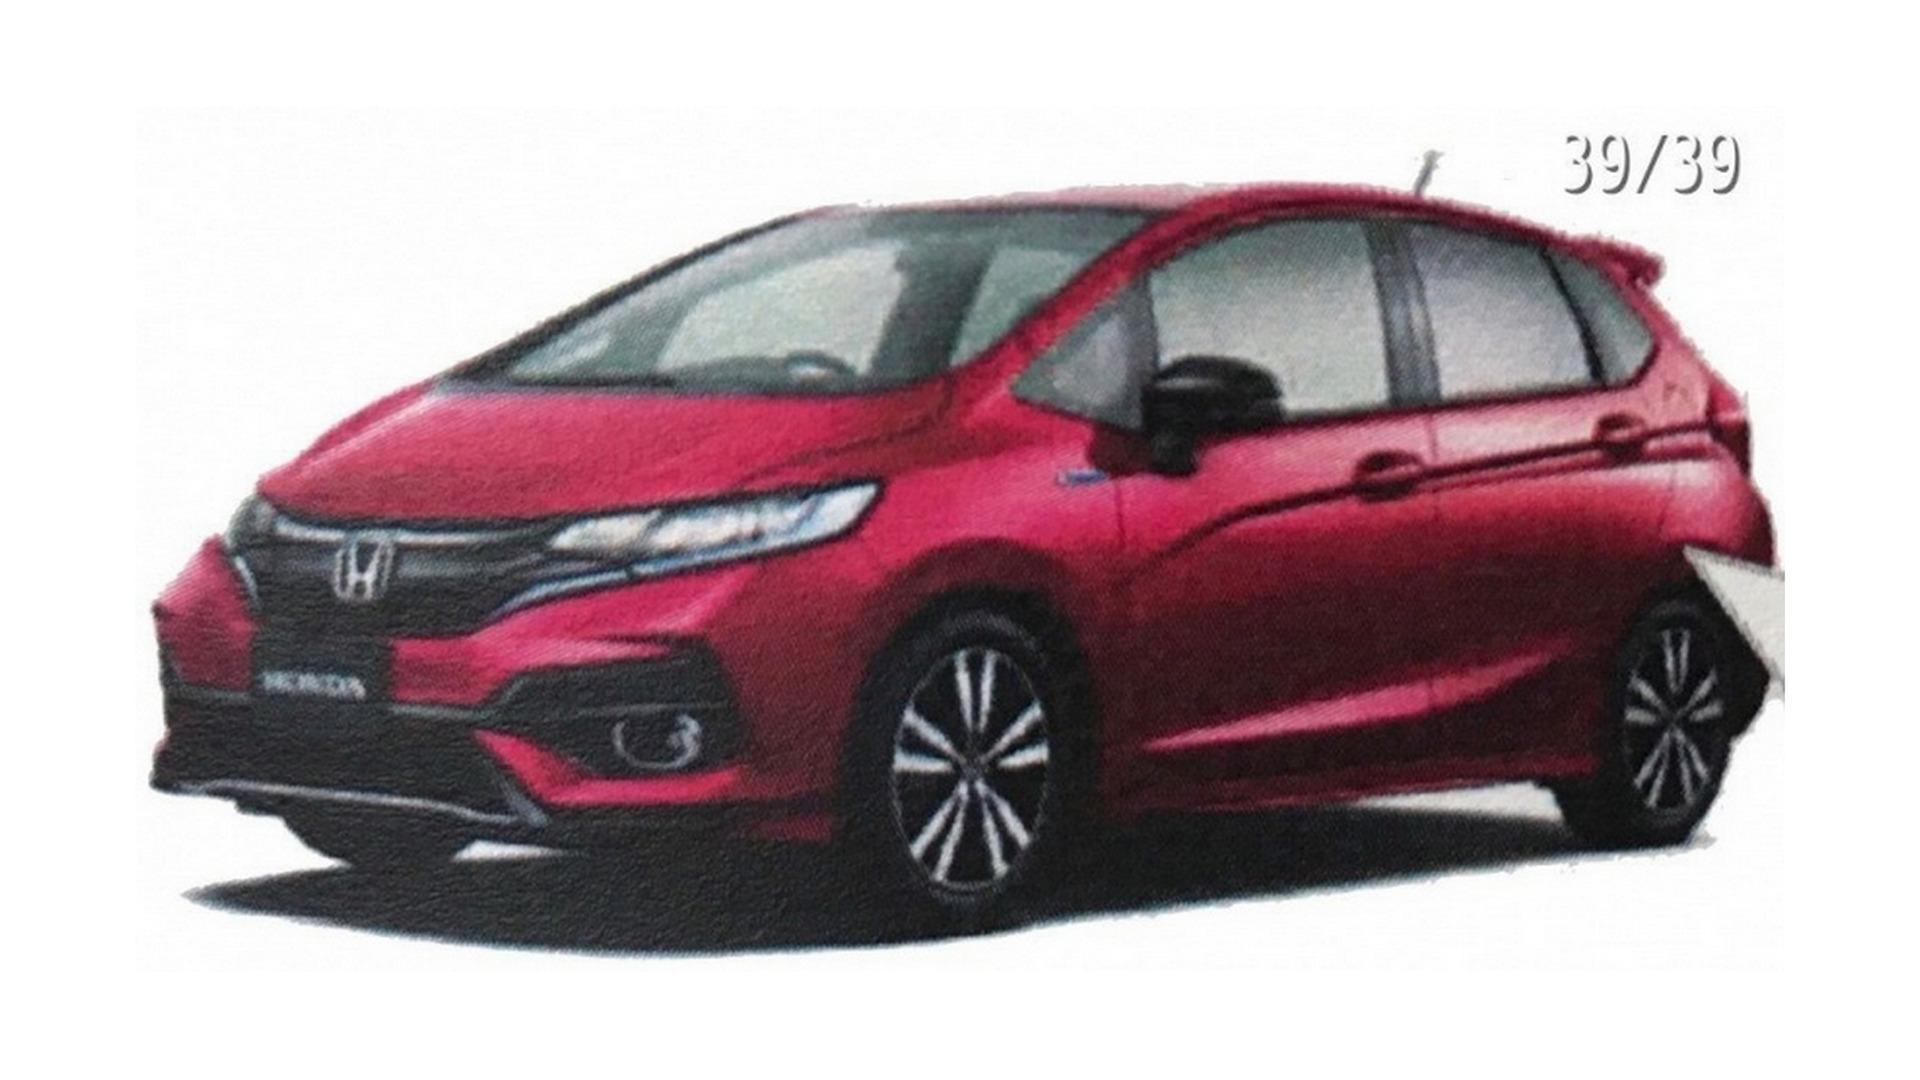 2018 Honda Fit Jazz Facelift Leaks Out In Brochure Images